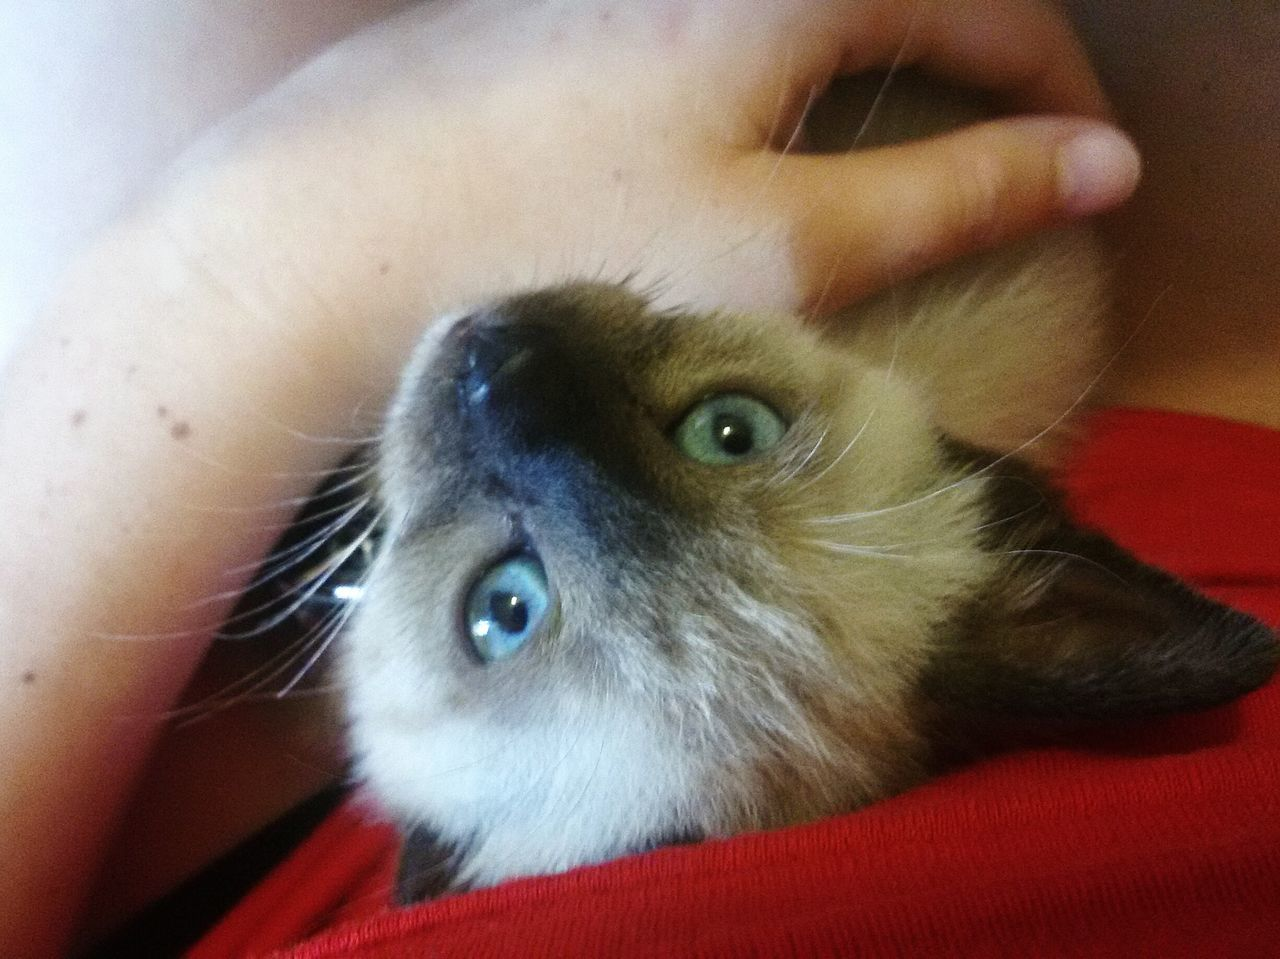 My Fixation ❤ Cat Miró  Eyeblue Sweet Prettycat Siamese